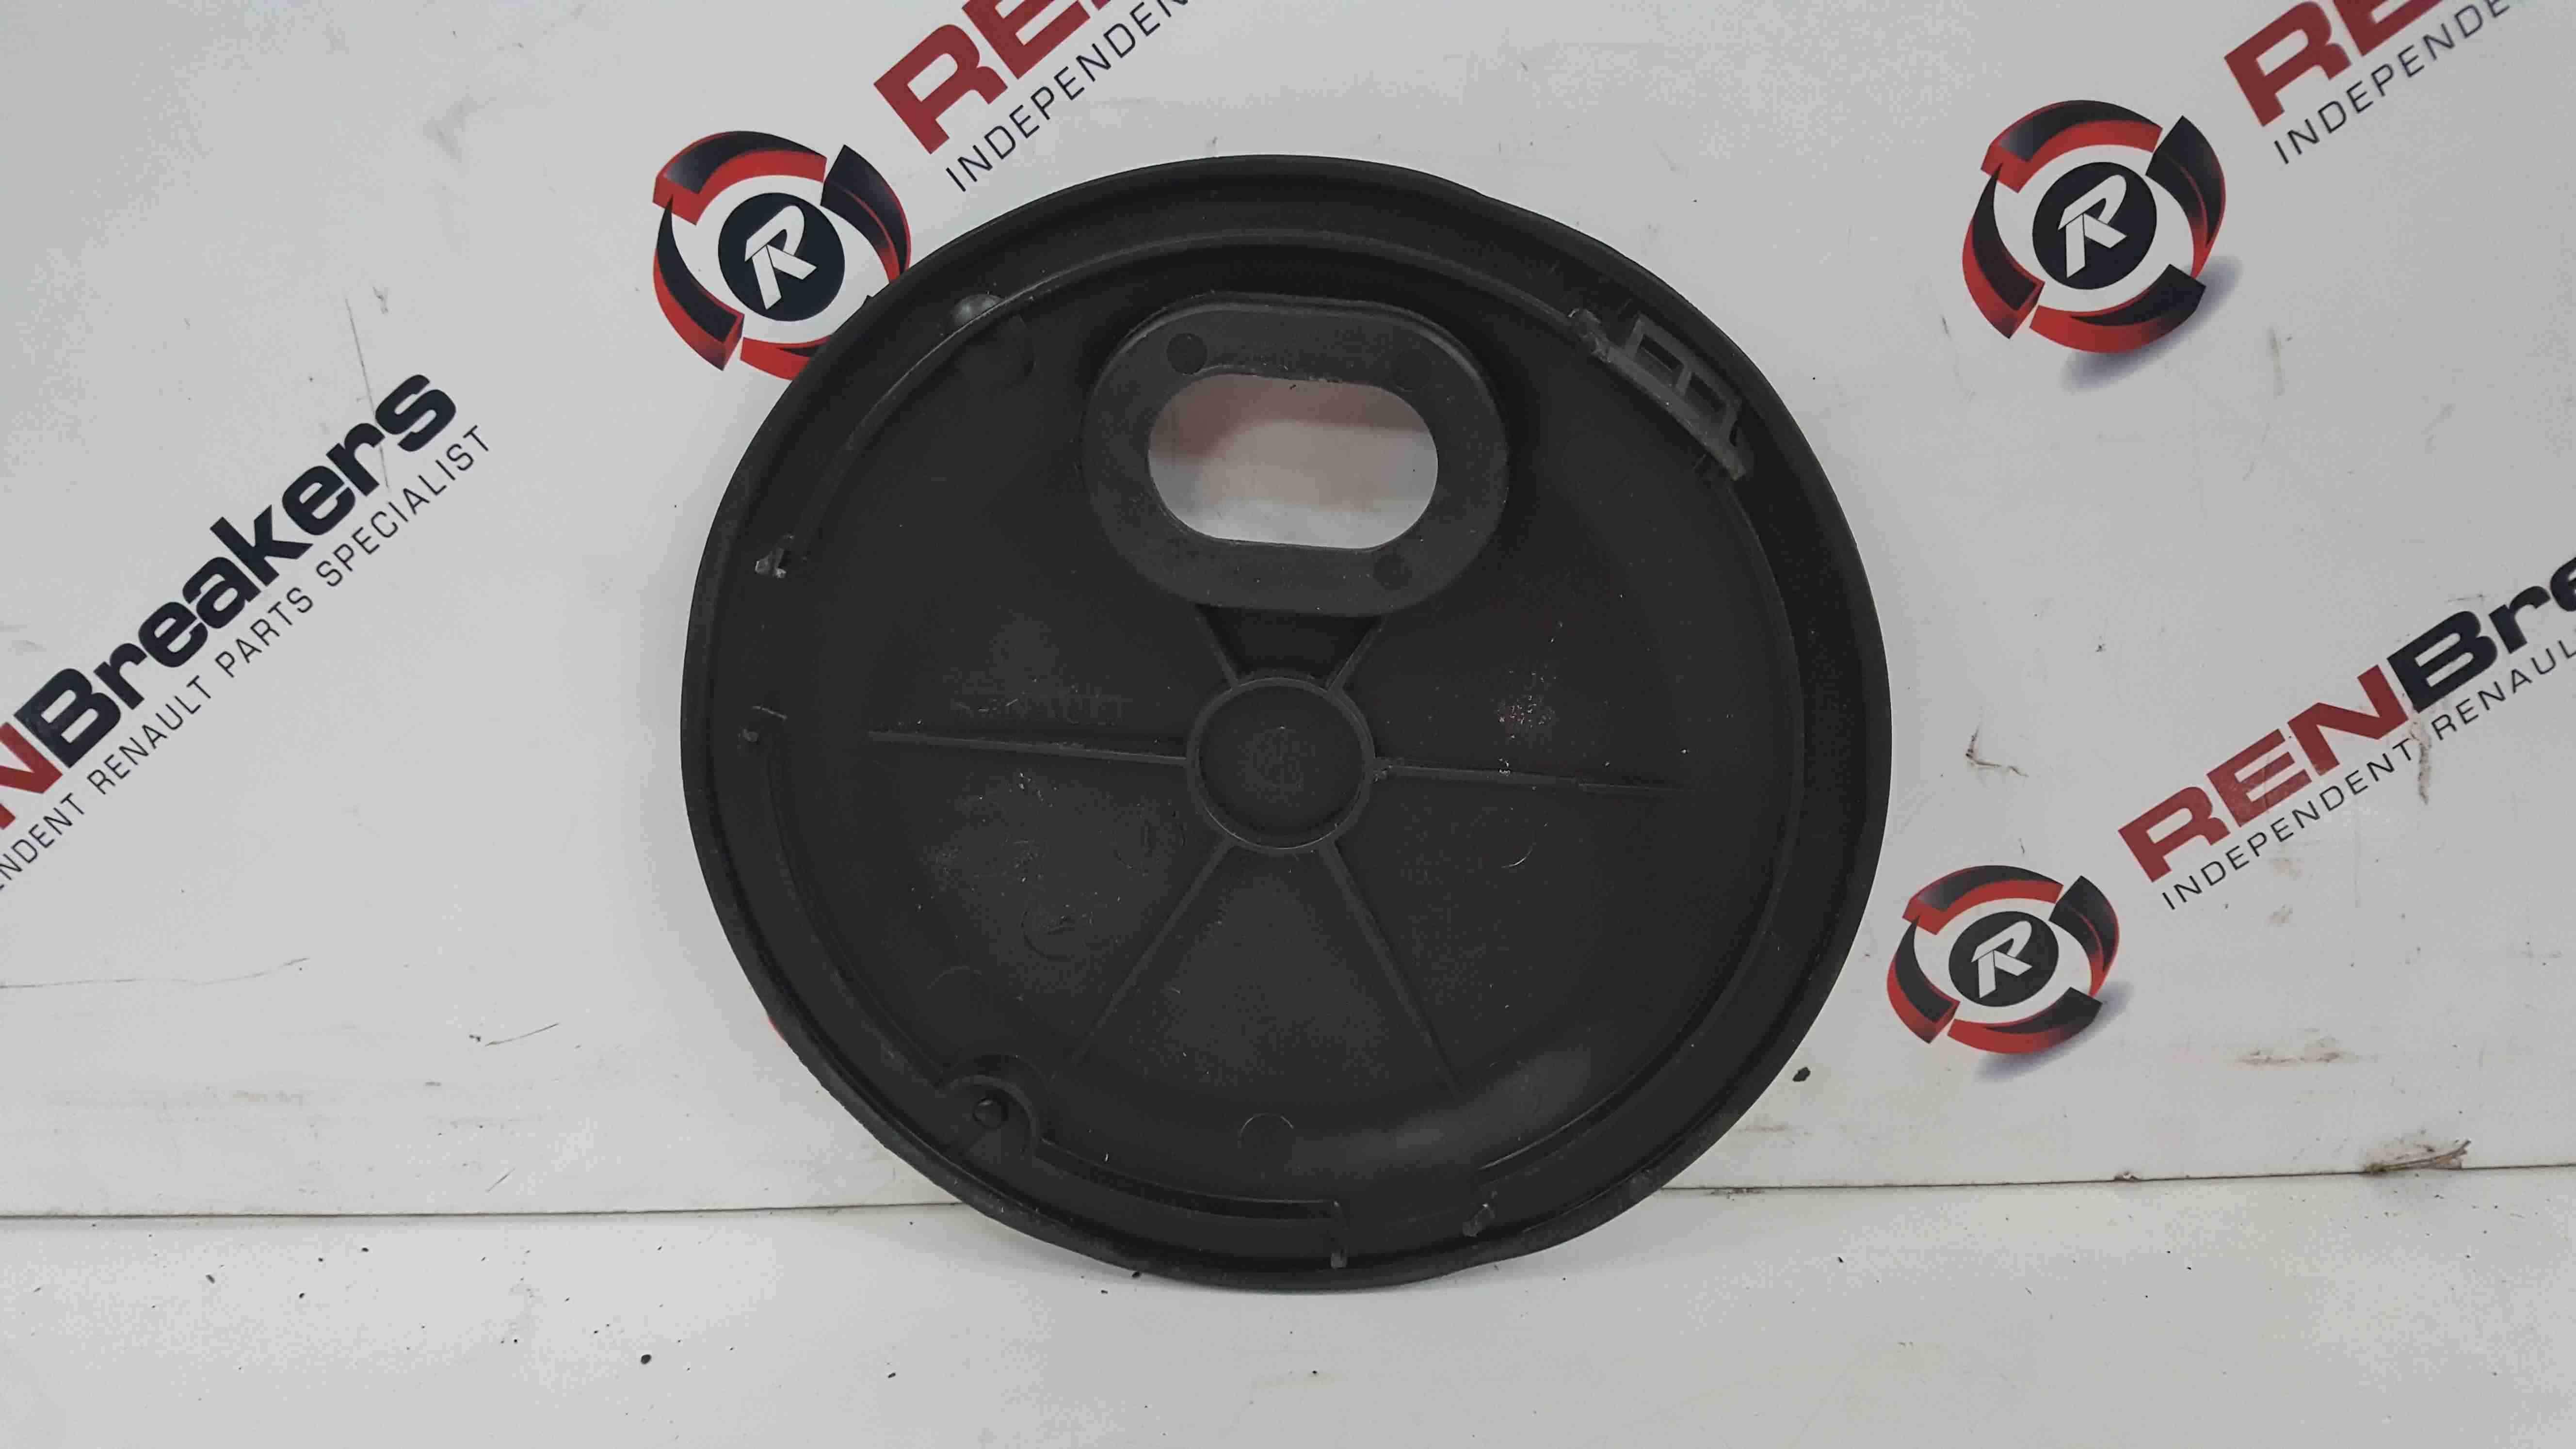 Renault Megane MK3 2008-2014 Fuel Tank Sender Cover Plate 8200280610